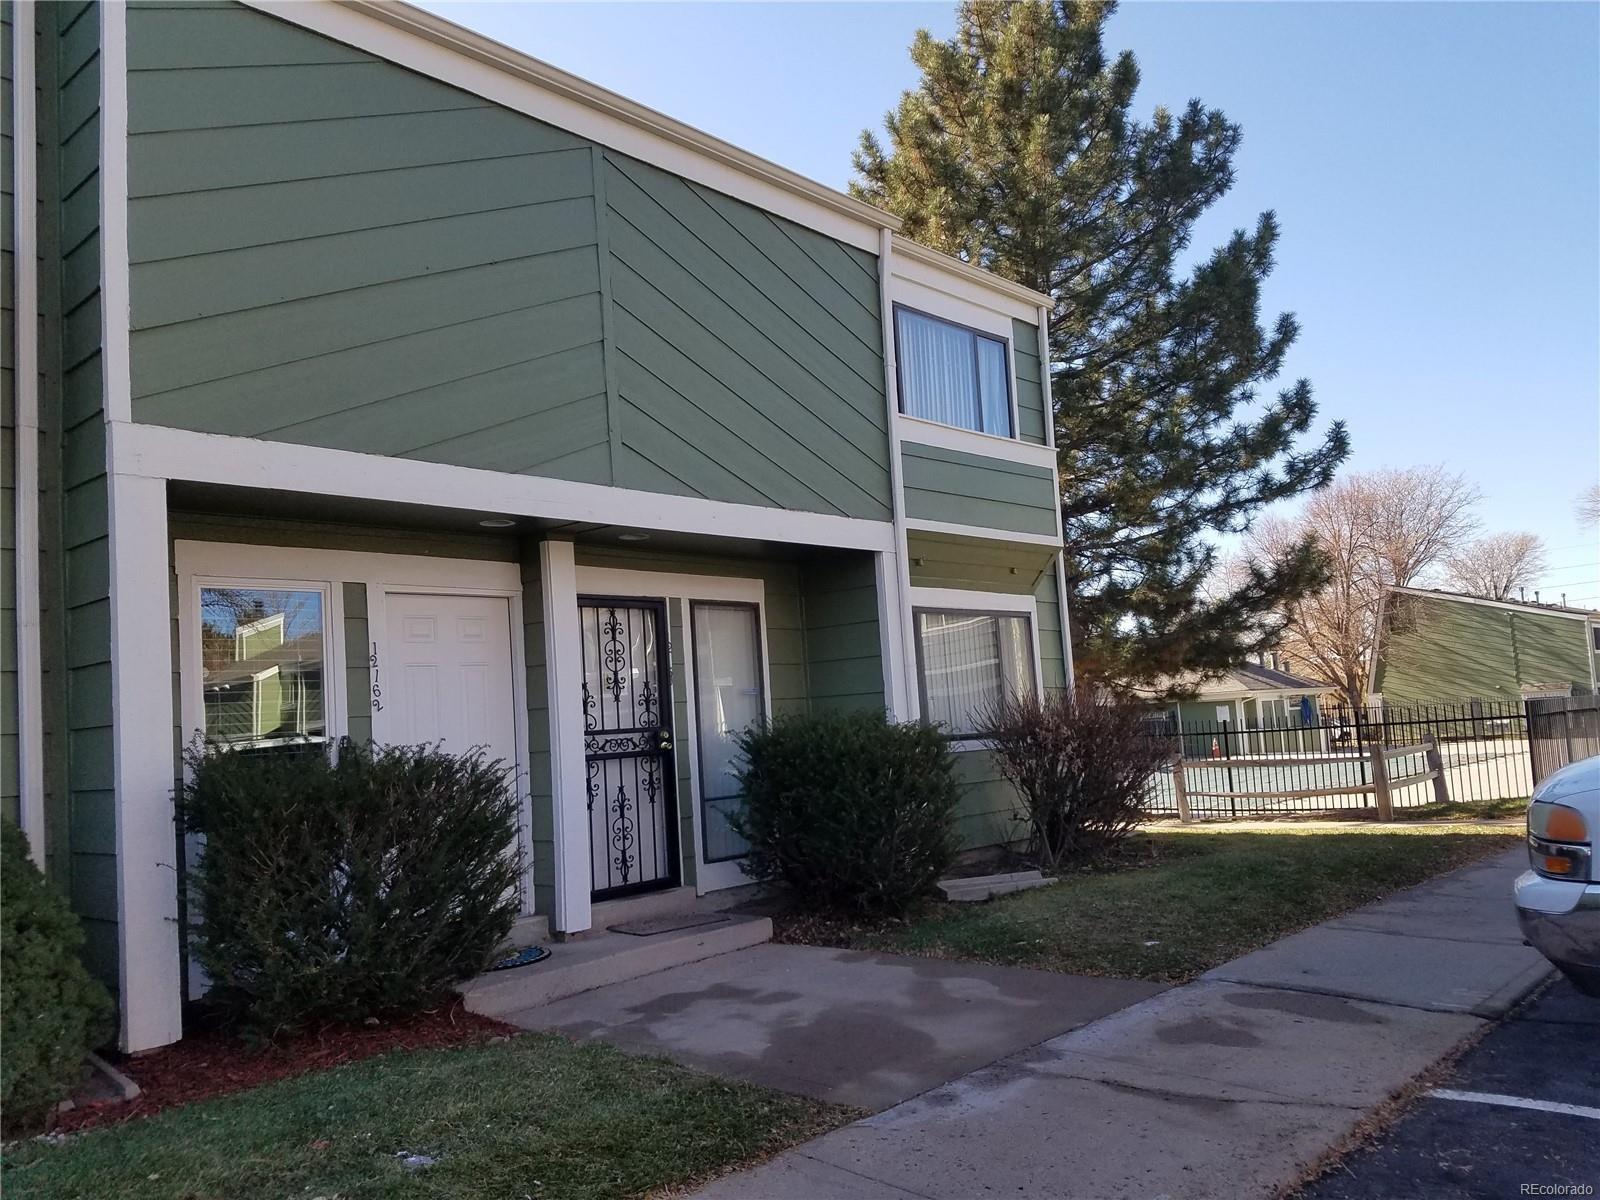 MLS# 6878459 - 2 - 12162 E Kepner Place, Aurora, CO 80012